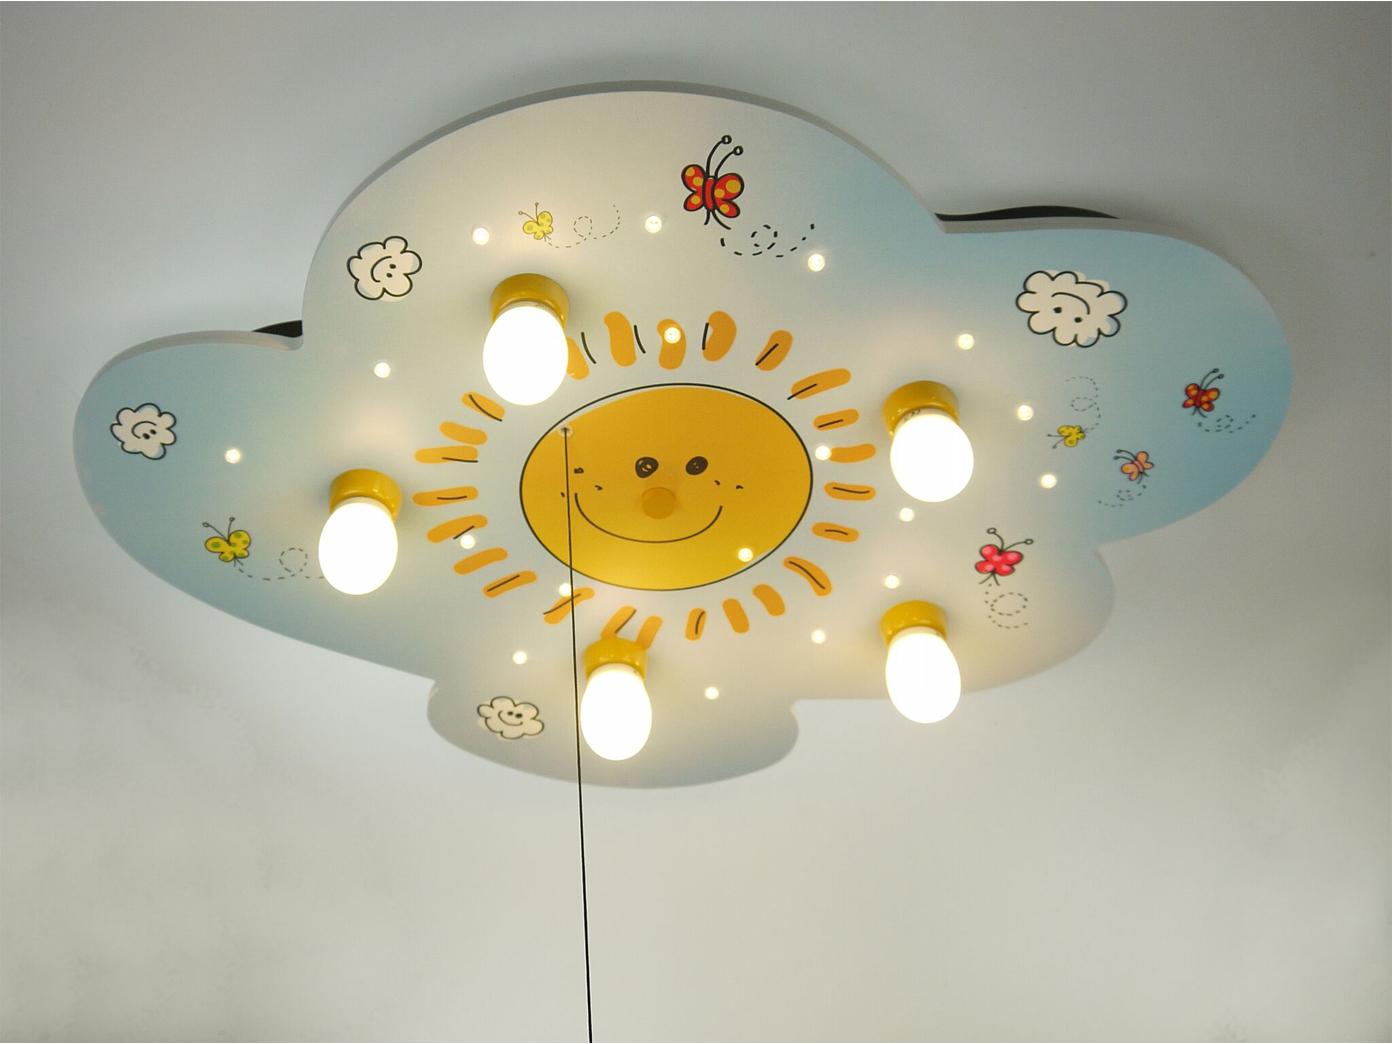 Plafón habitación infantil Alexa, apaga apaga Alexa, las nubes a lámpara luz de relajación Sunny 48a286